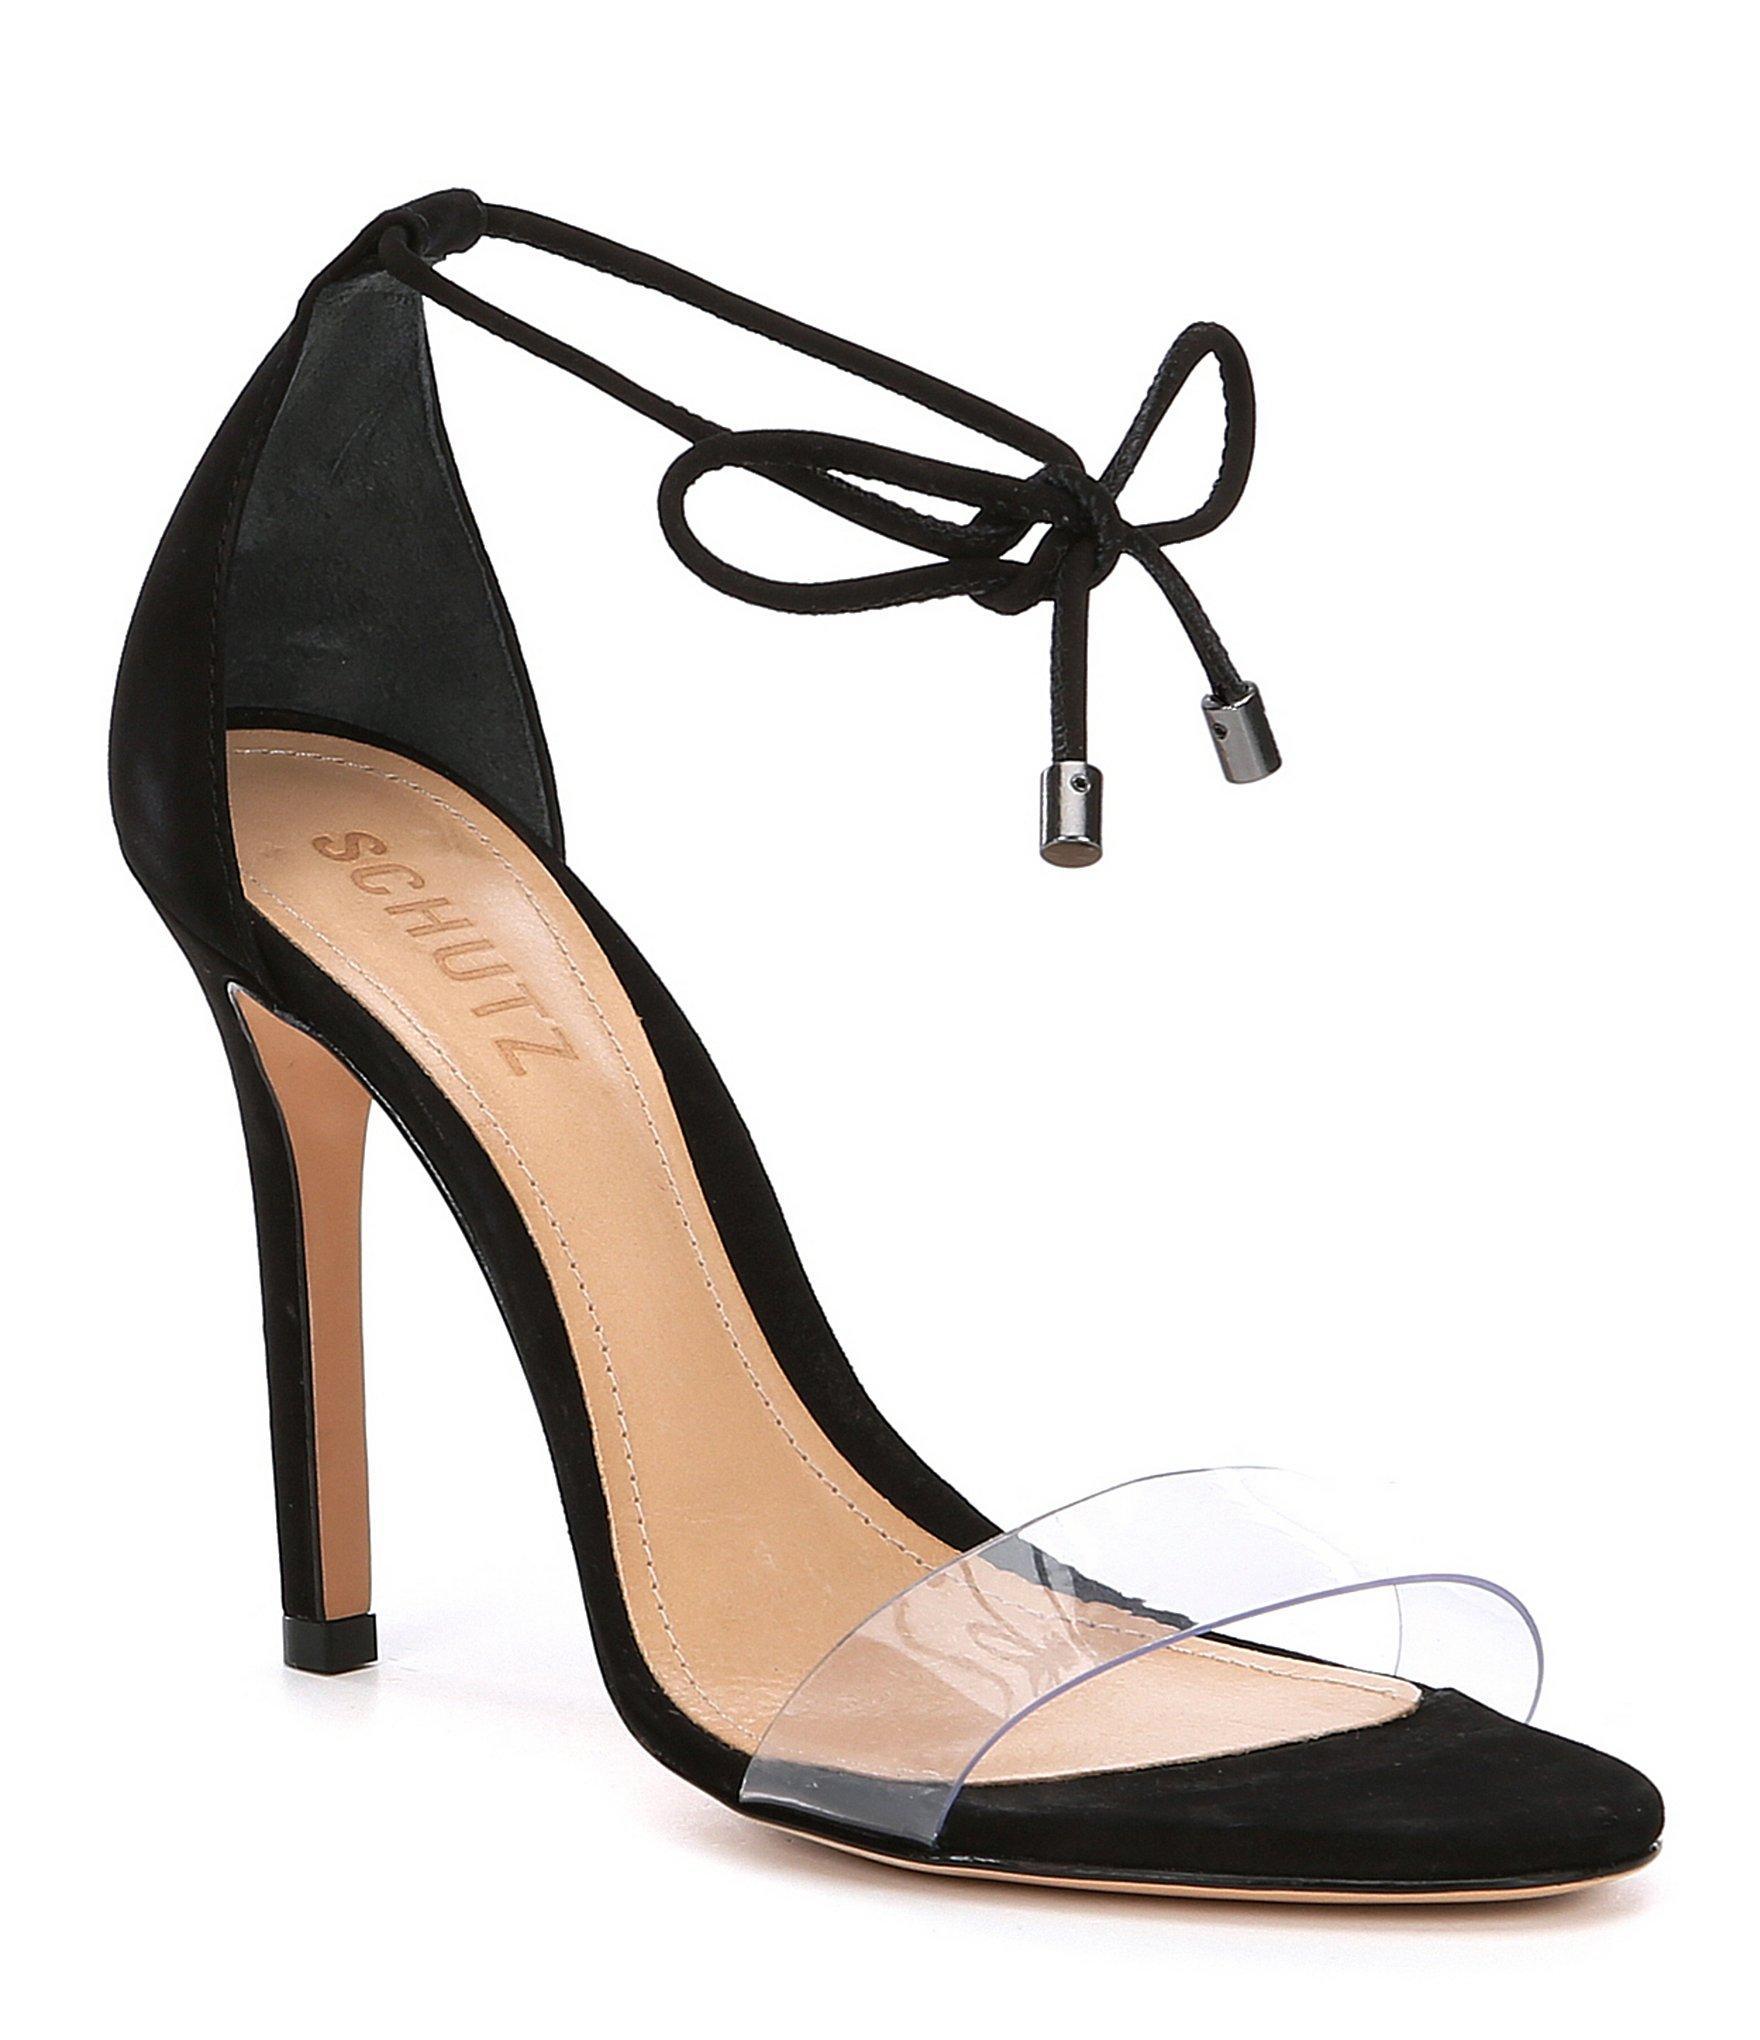 7a63f0a5fd6e Schutz - Black Josseana Nubuck Dress Sandals - Lyst. View fullscreen